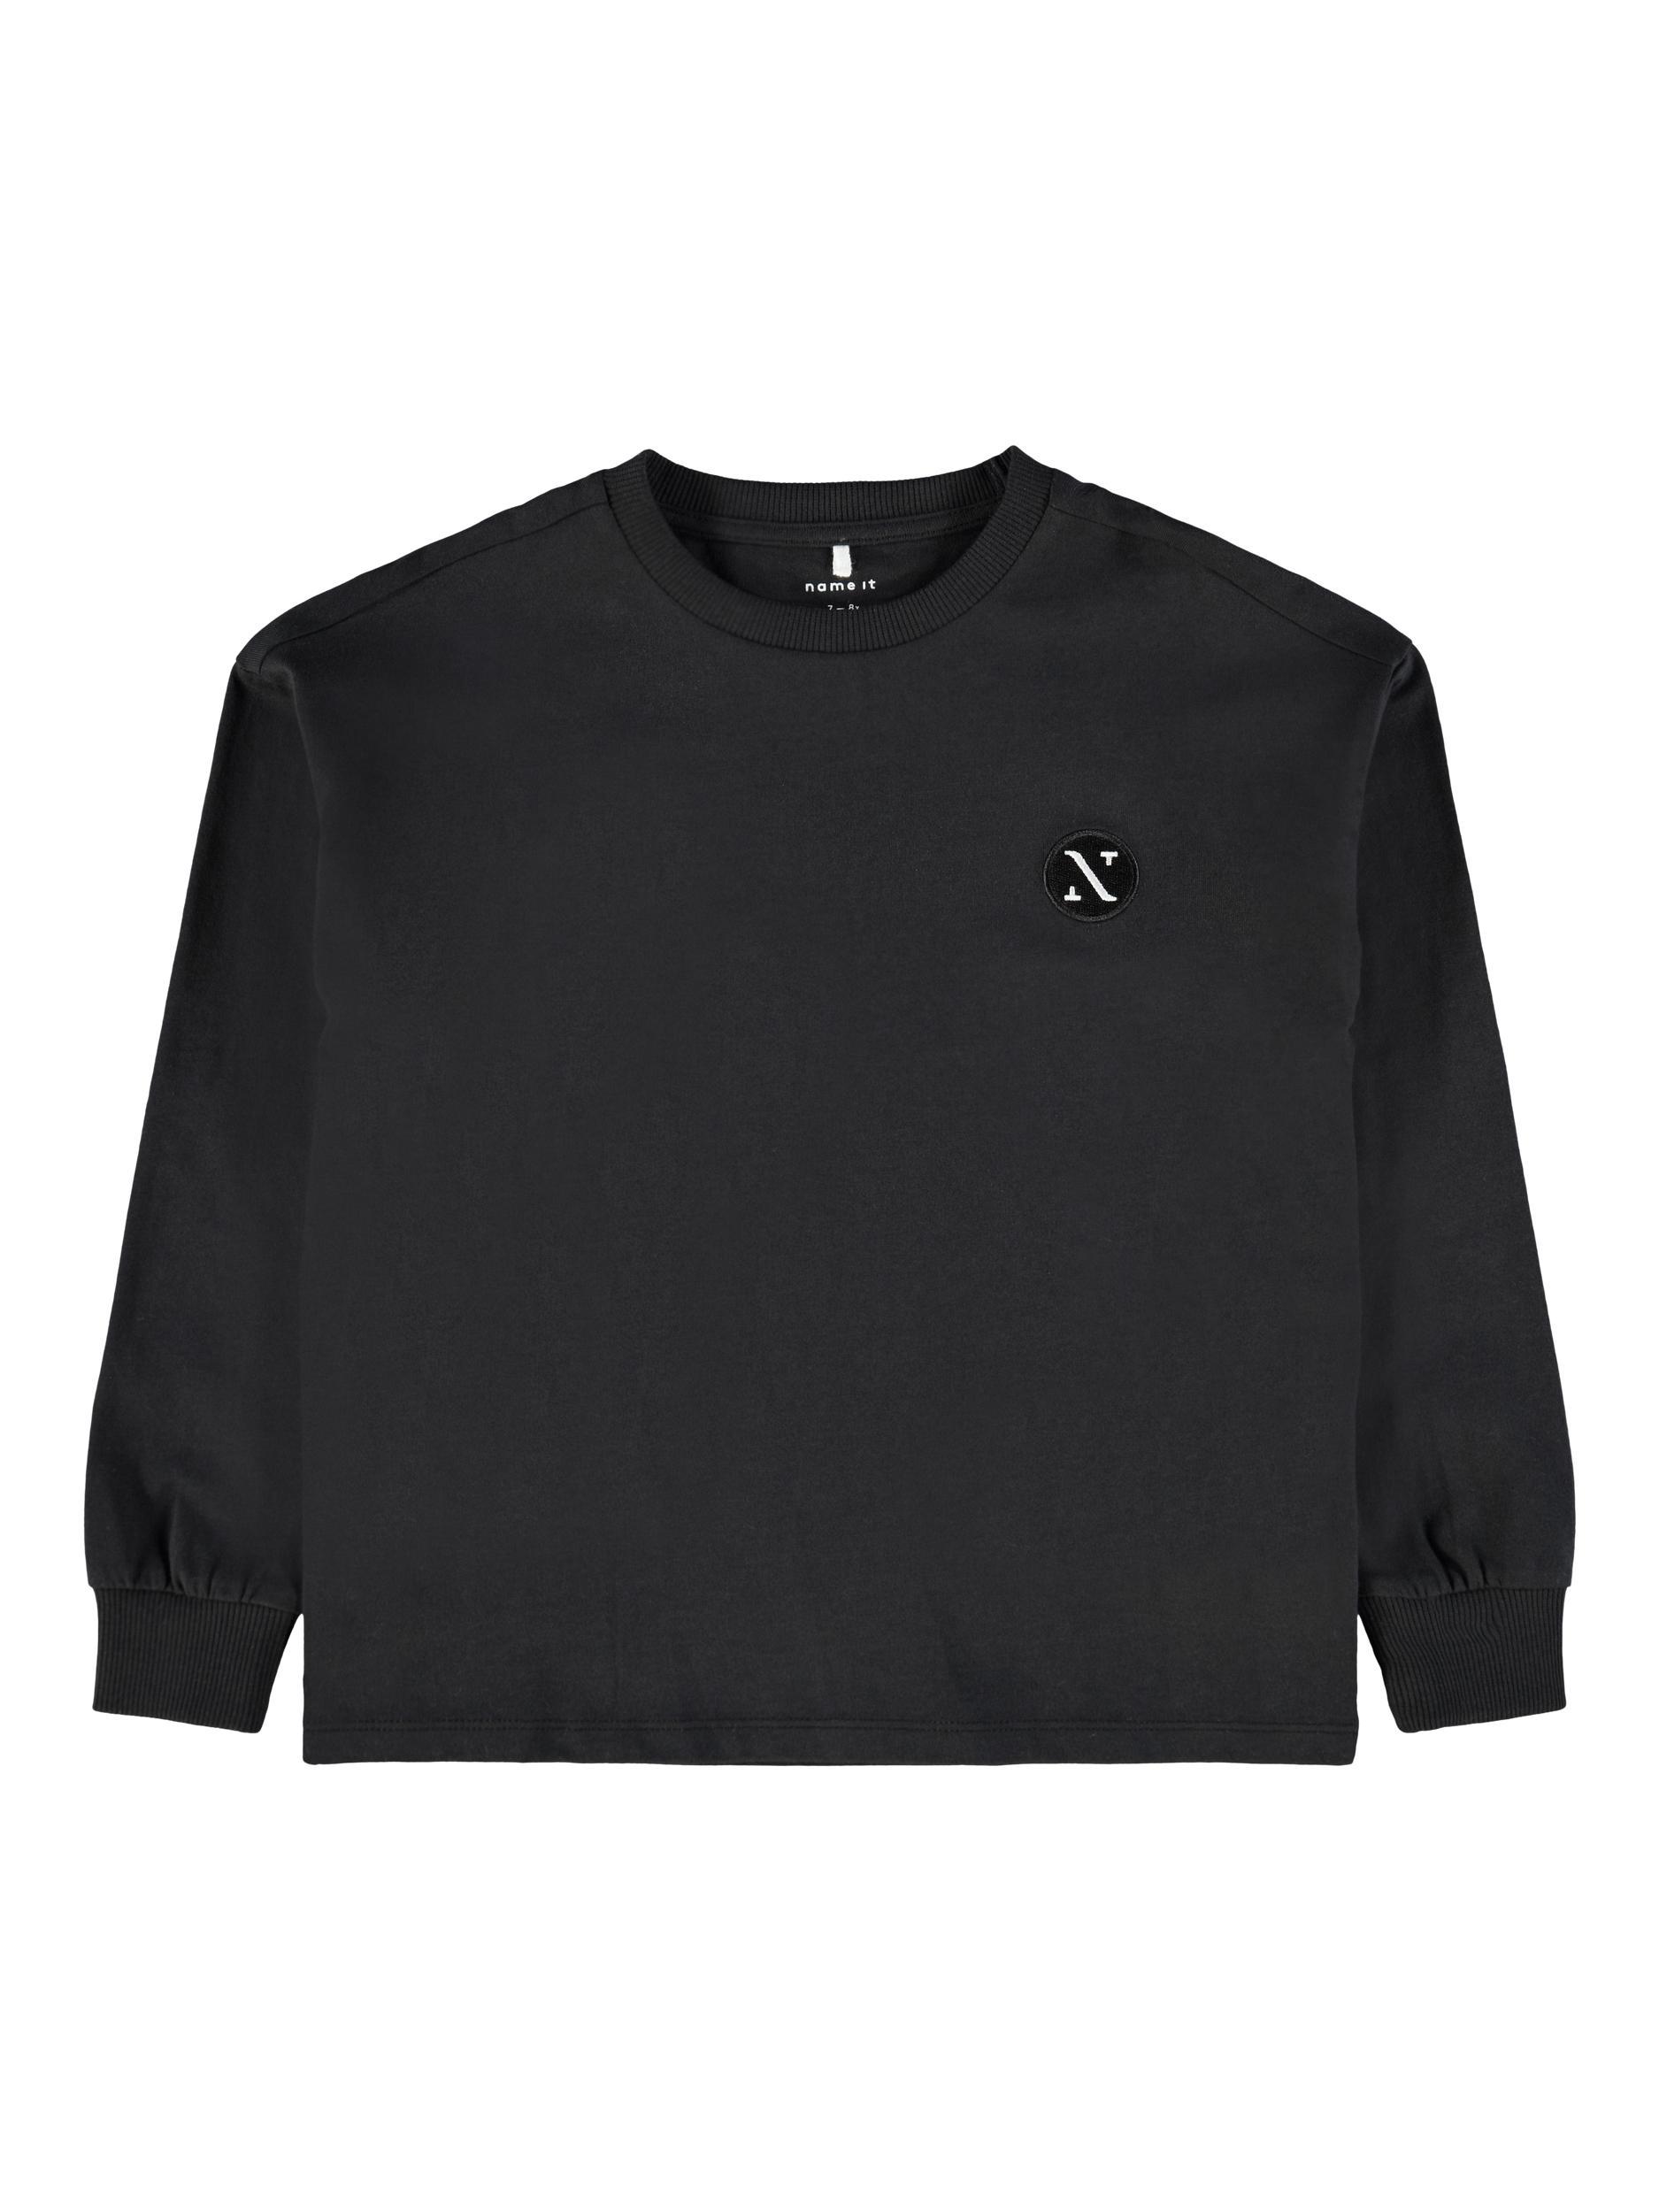 Name It Balder LS t-shirt, black, 122-128